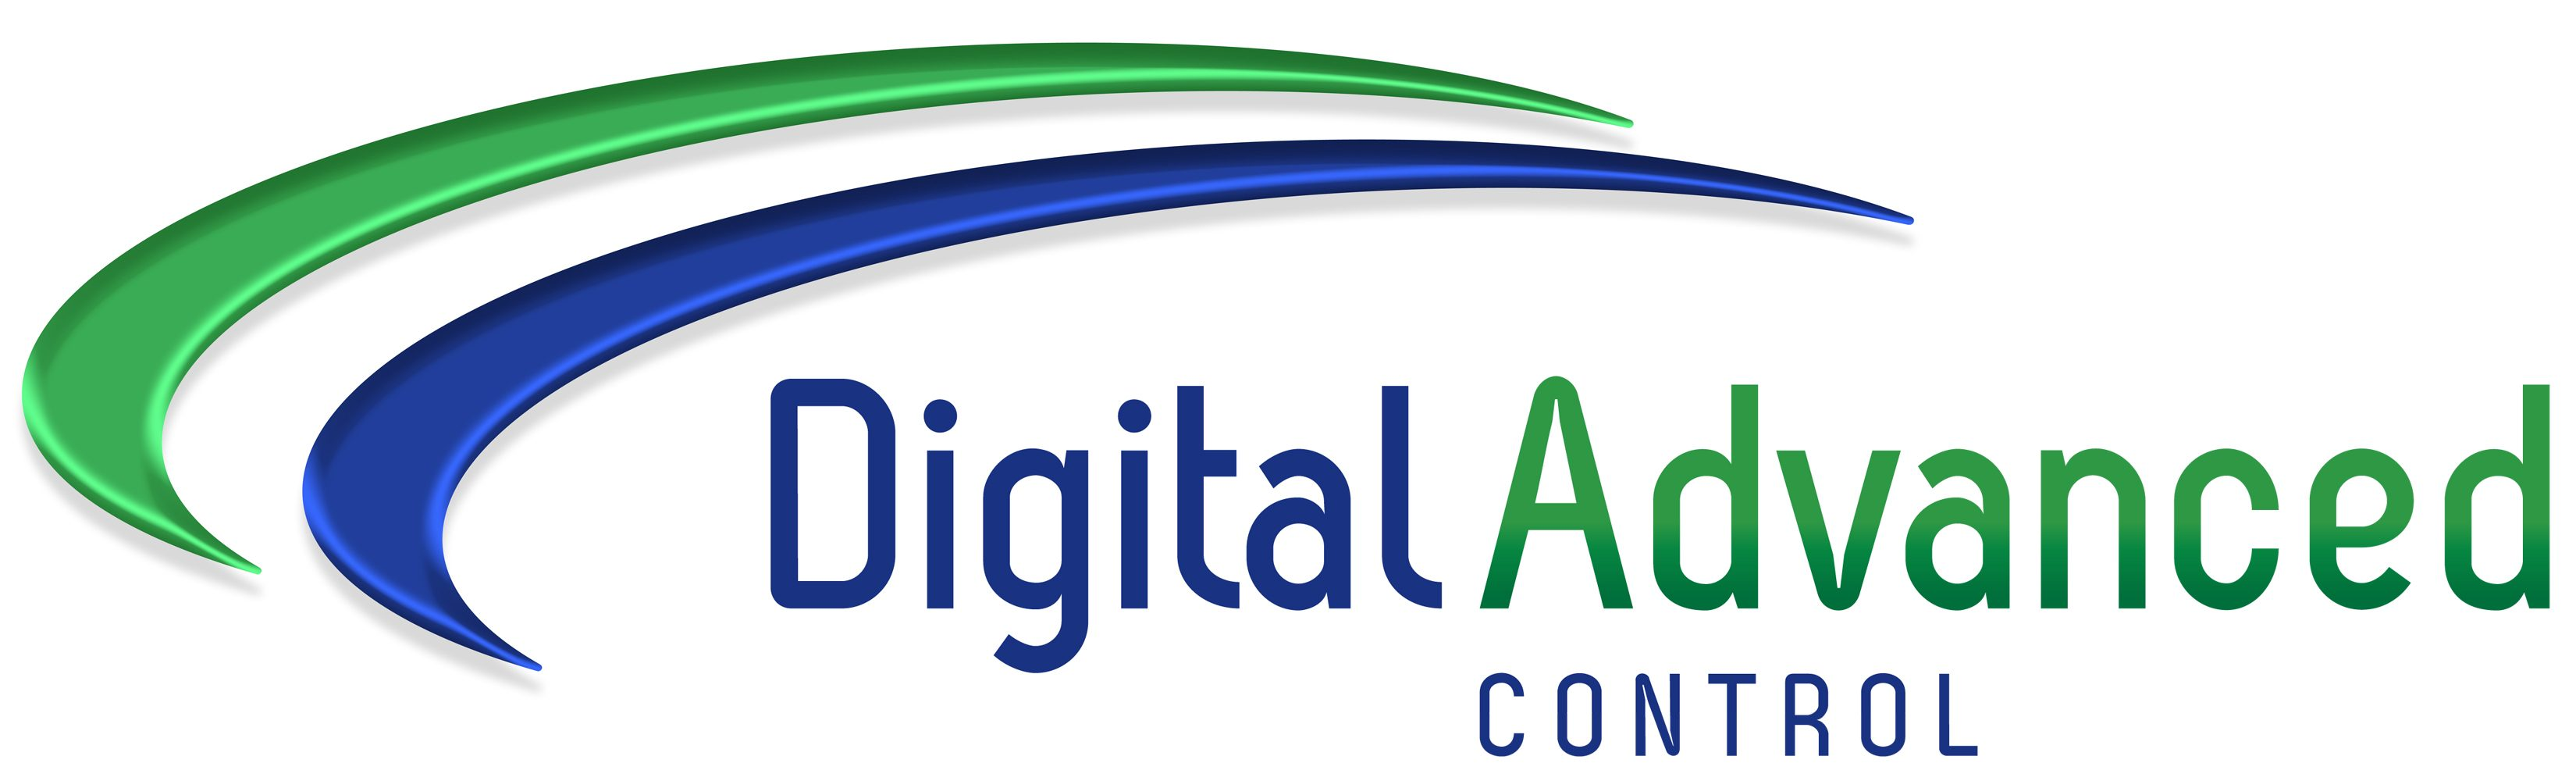 Digital Advanced Control